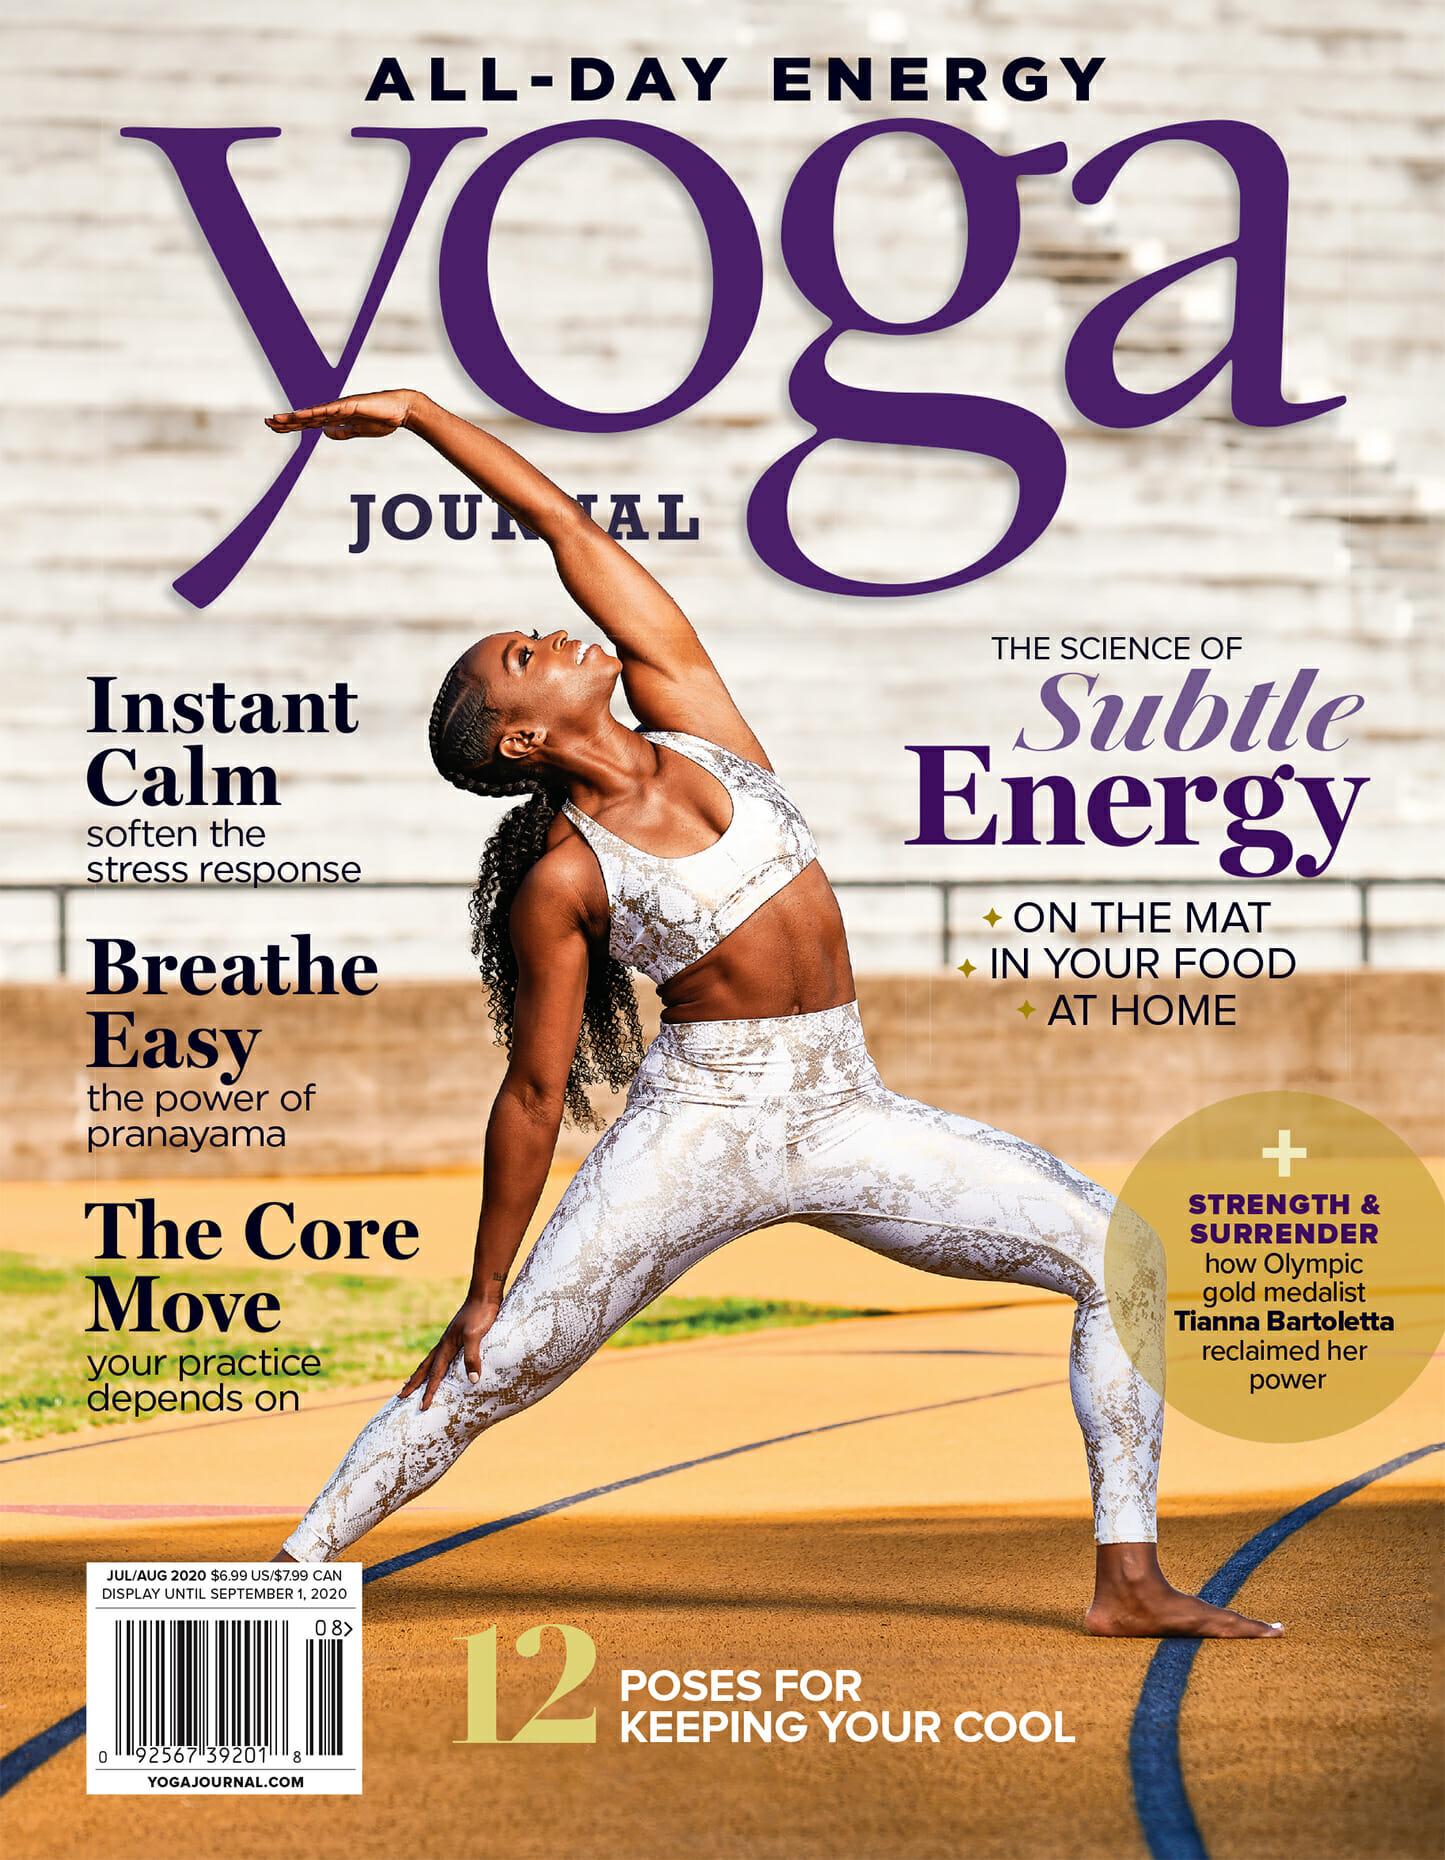 Tianna Bartoletta Yoga Journal magazine cover